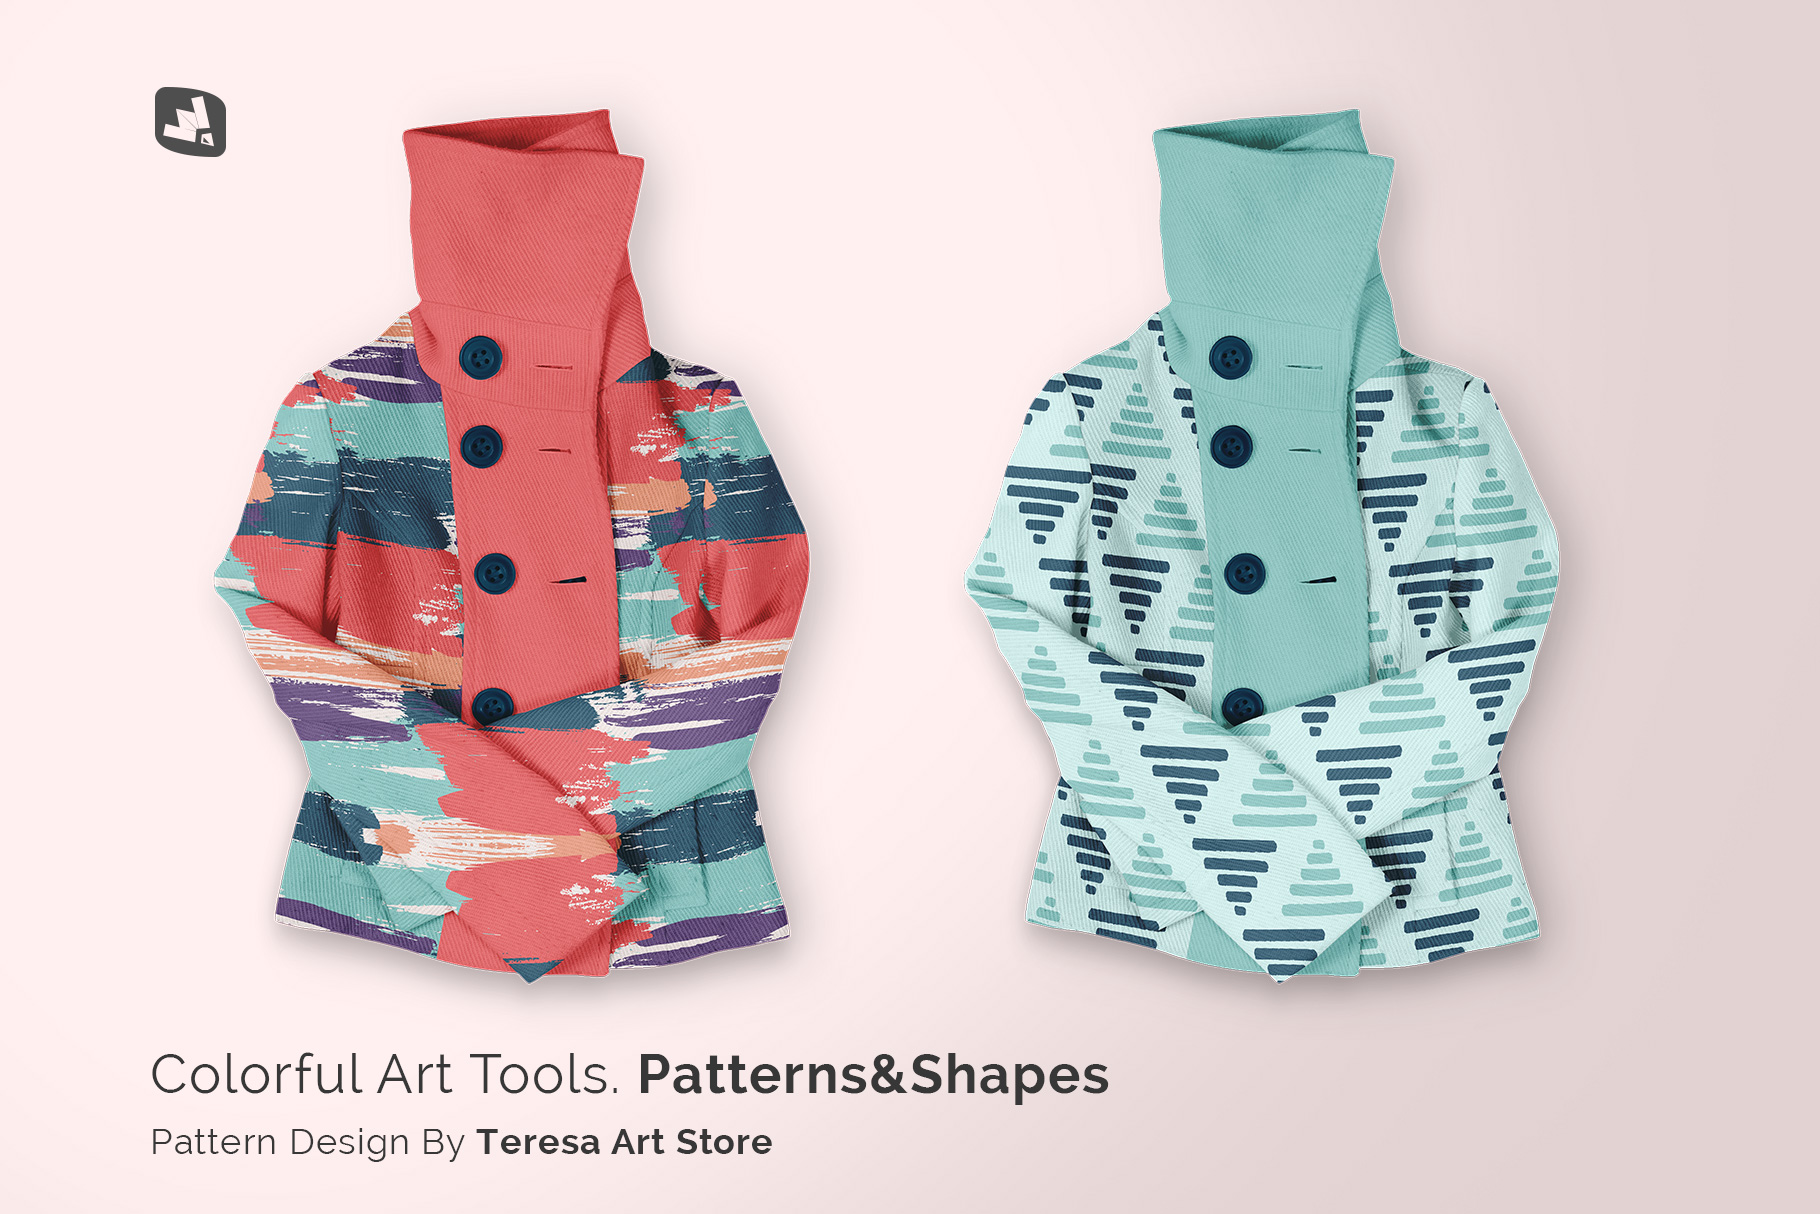 designer's credit of the women's high collar jacket mockup